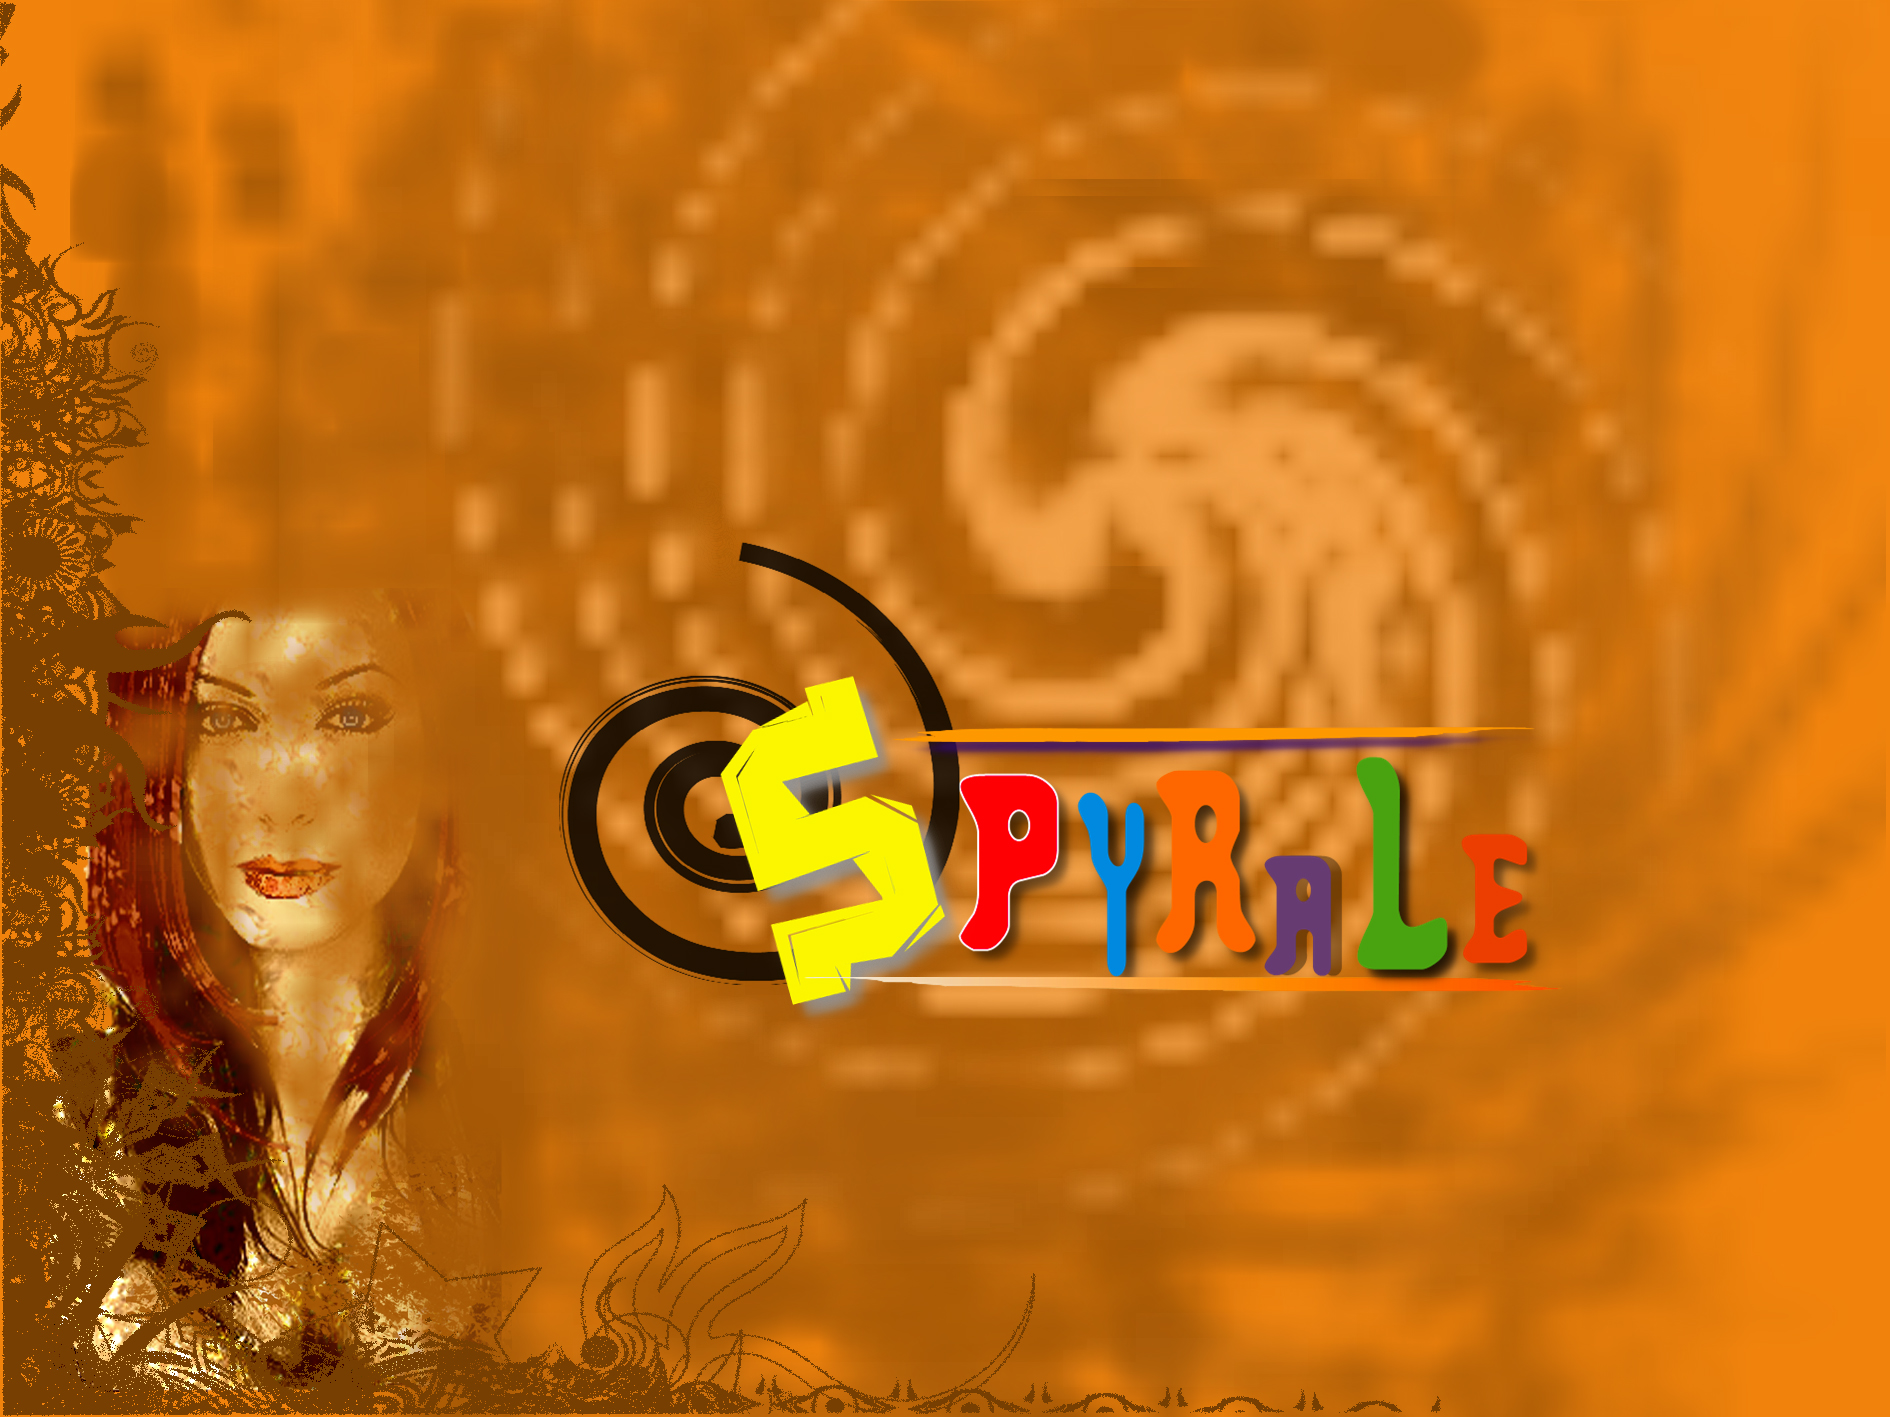 Spyrale